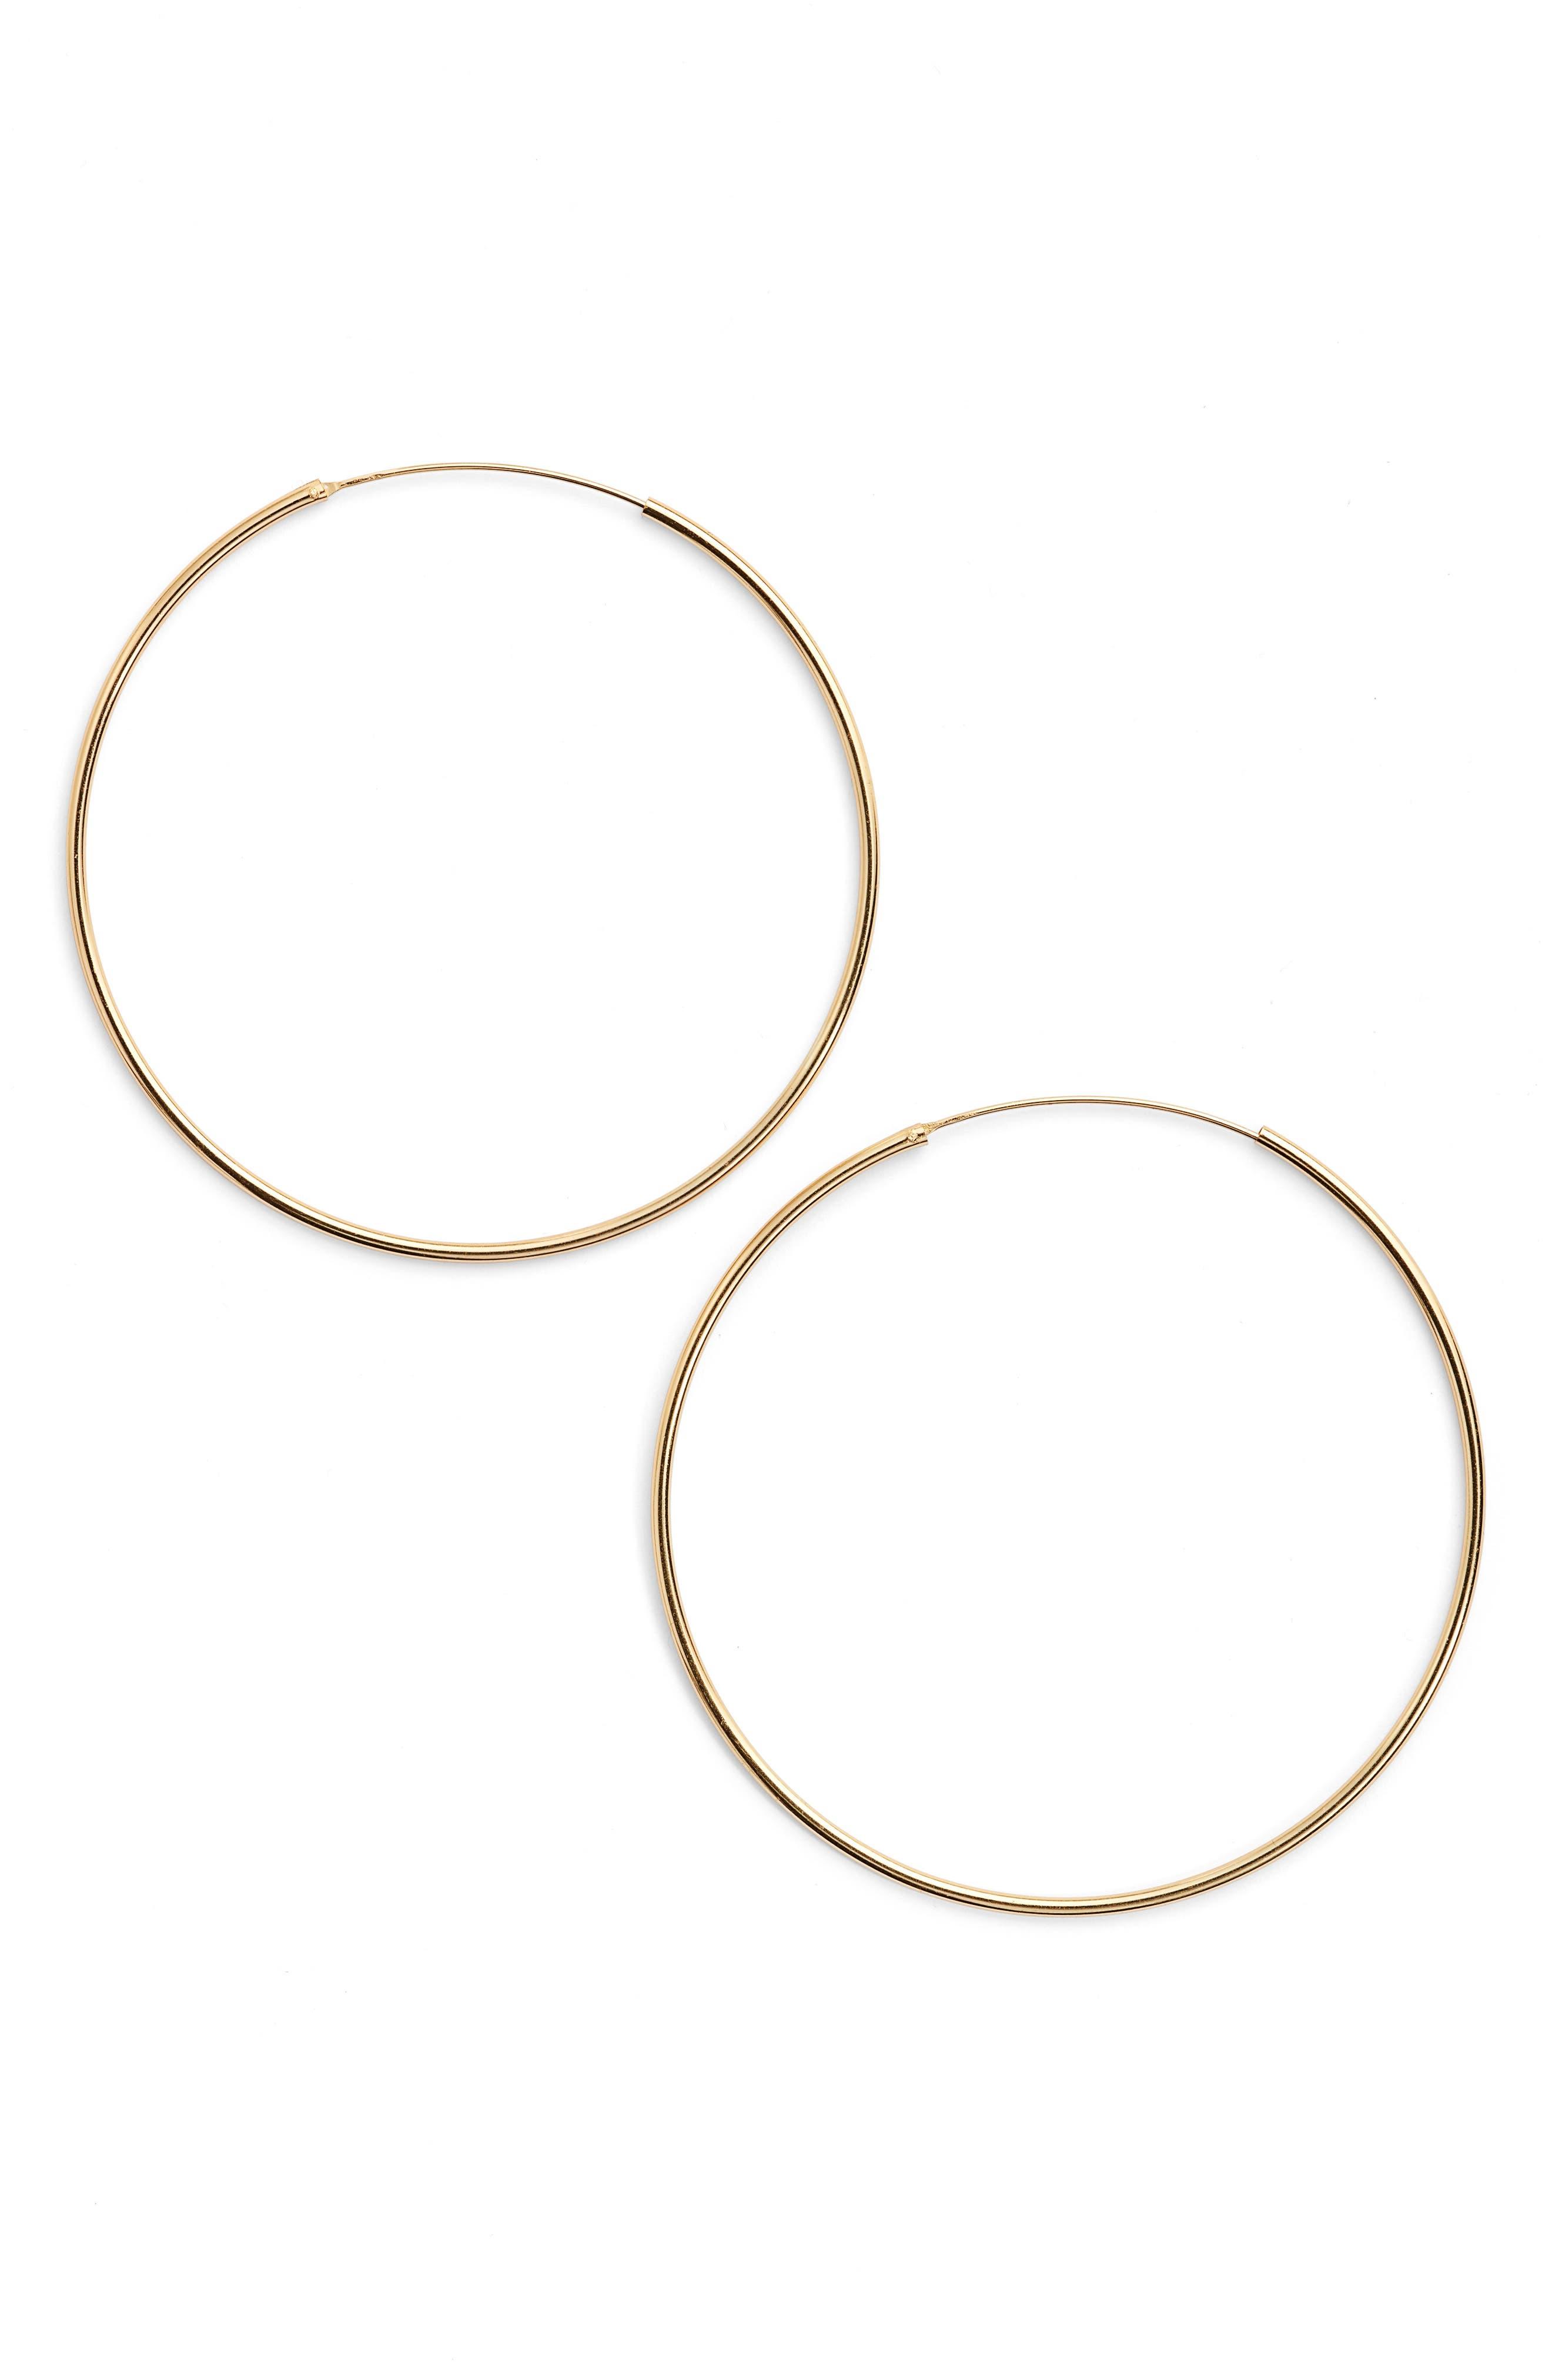 Women's Argento Vivo Extra Large Endless Hoop Earrings